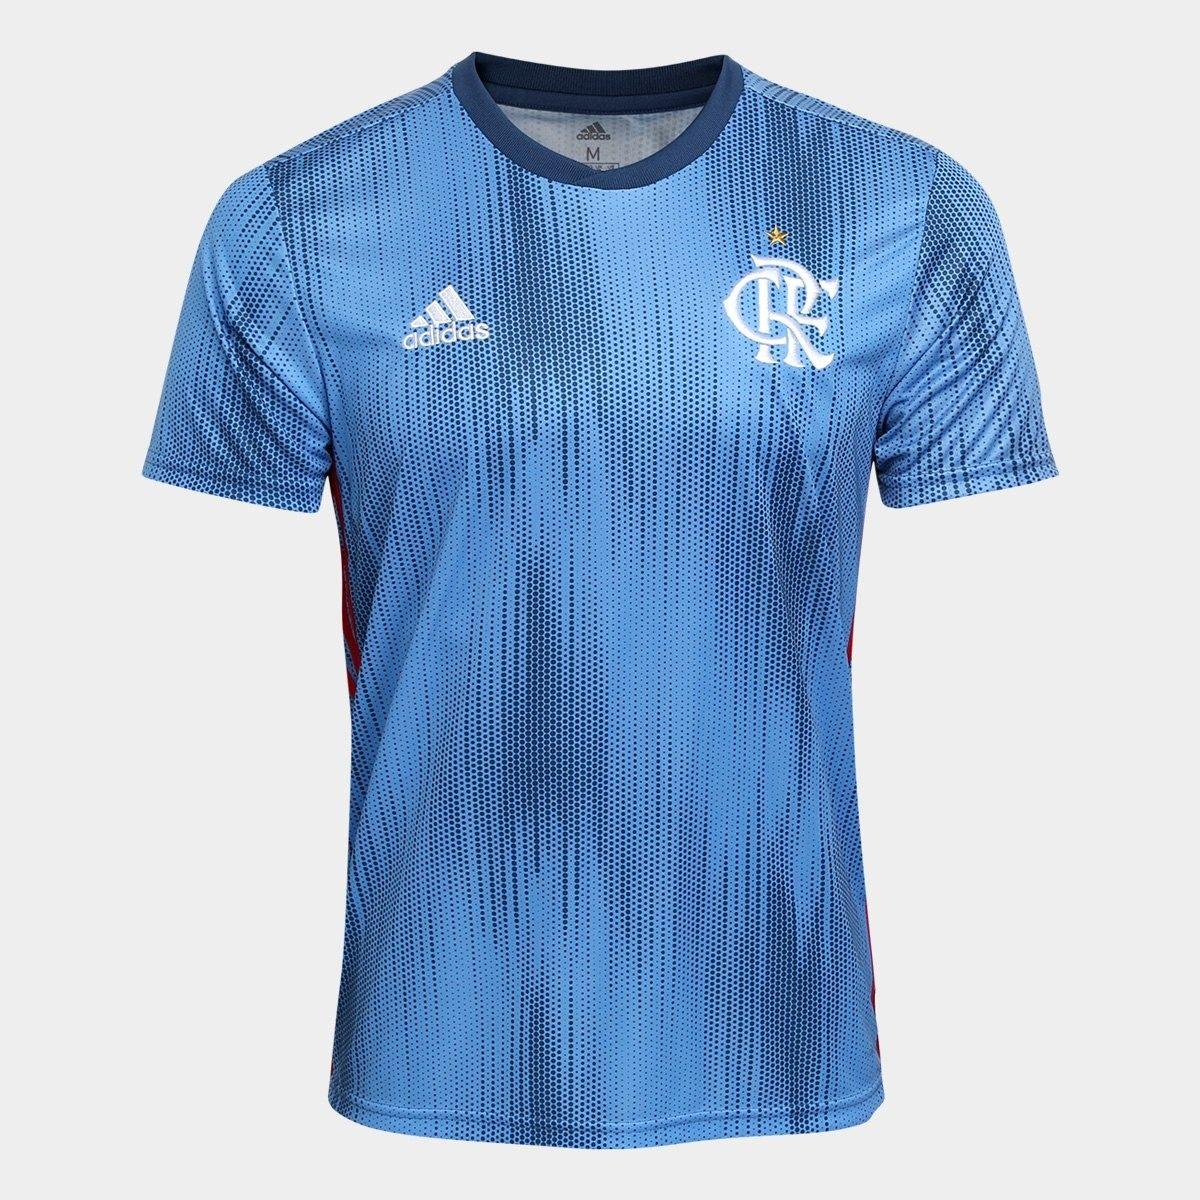 Camisa Flamengo Iii S n° Oficial Torcedor adidas Masculina - R  125 ... 425a01f551b5c